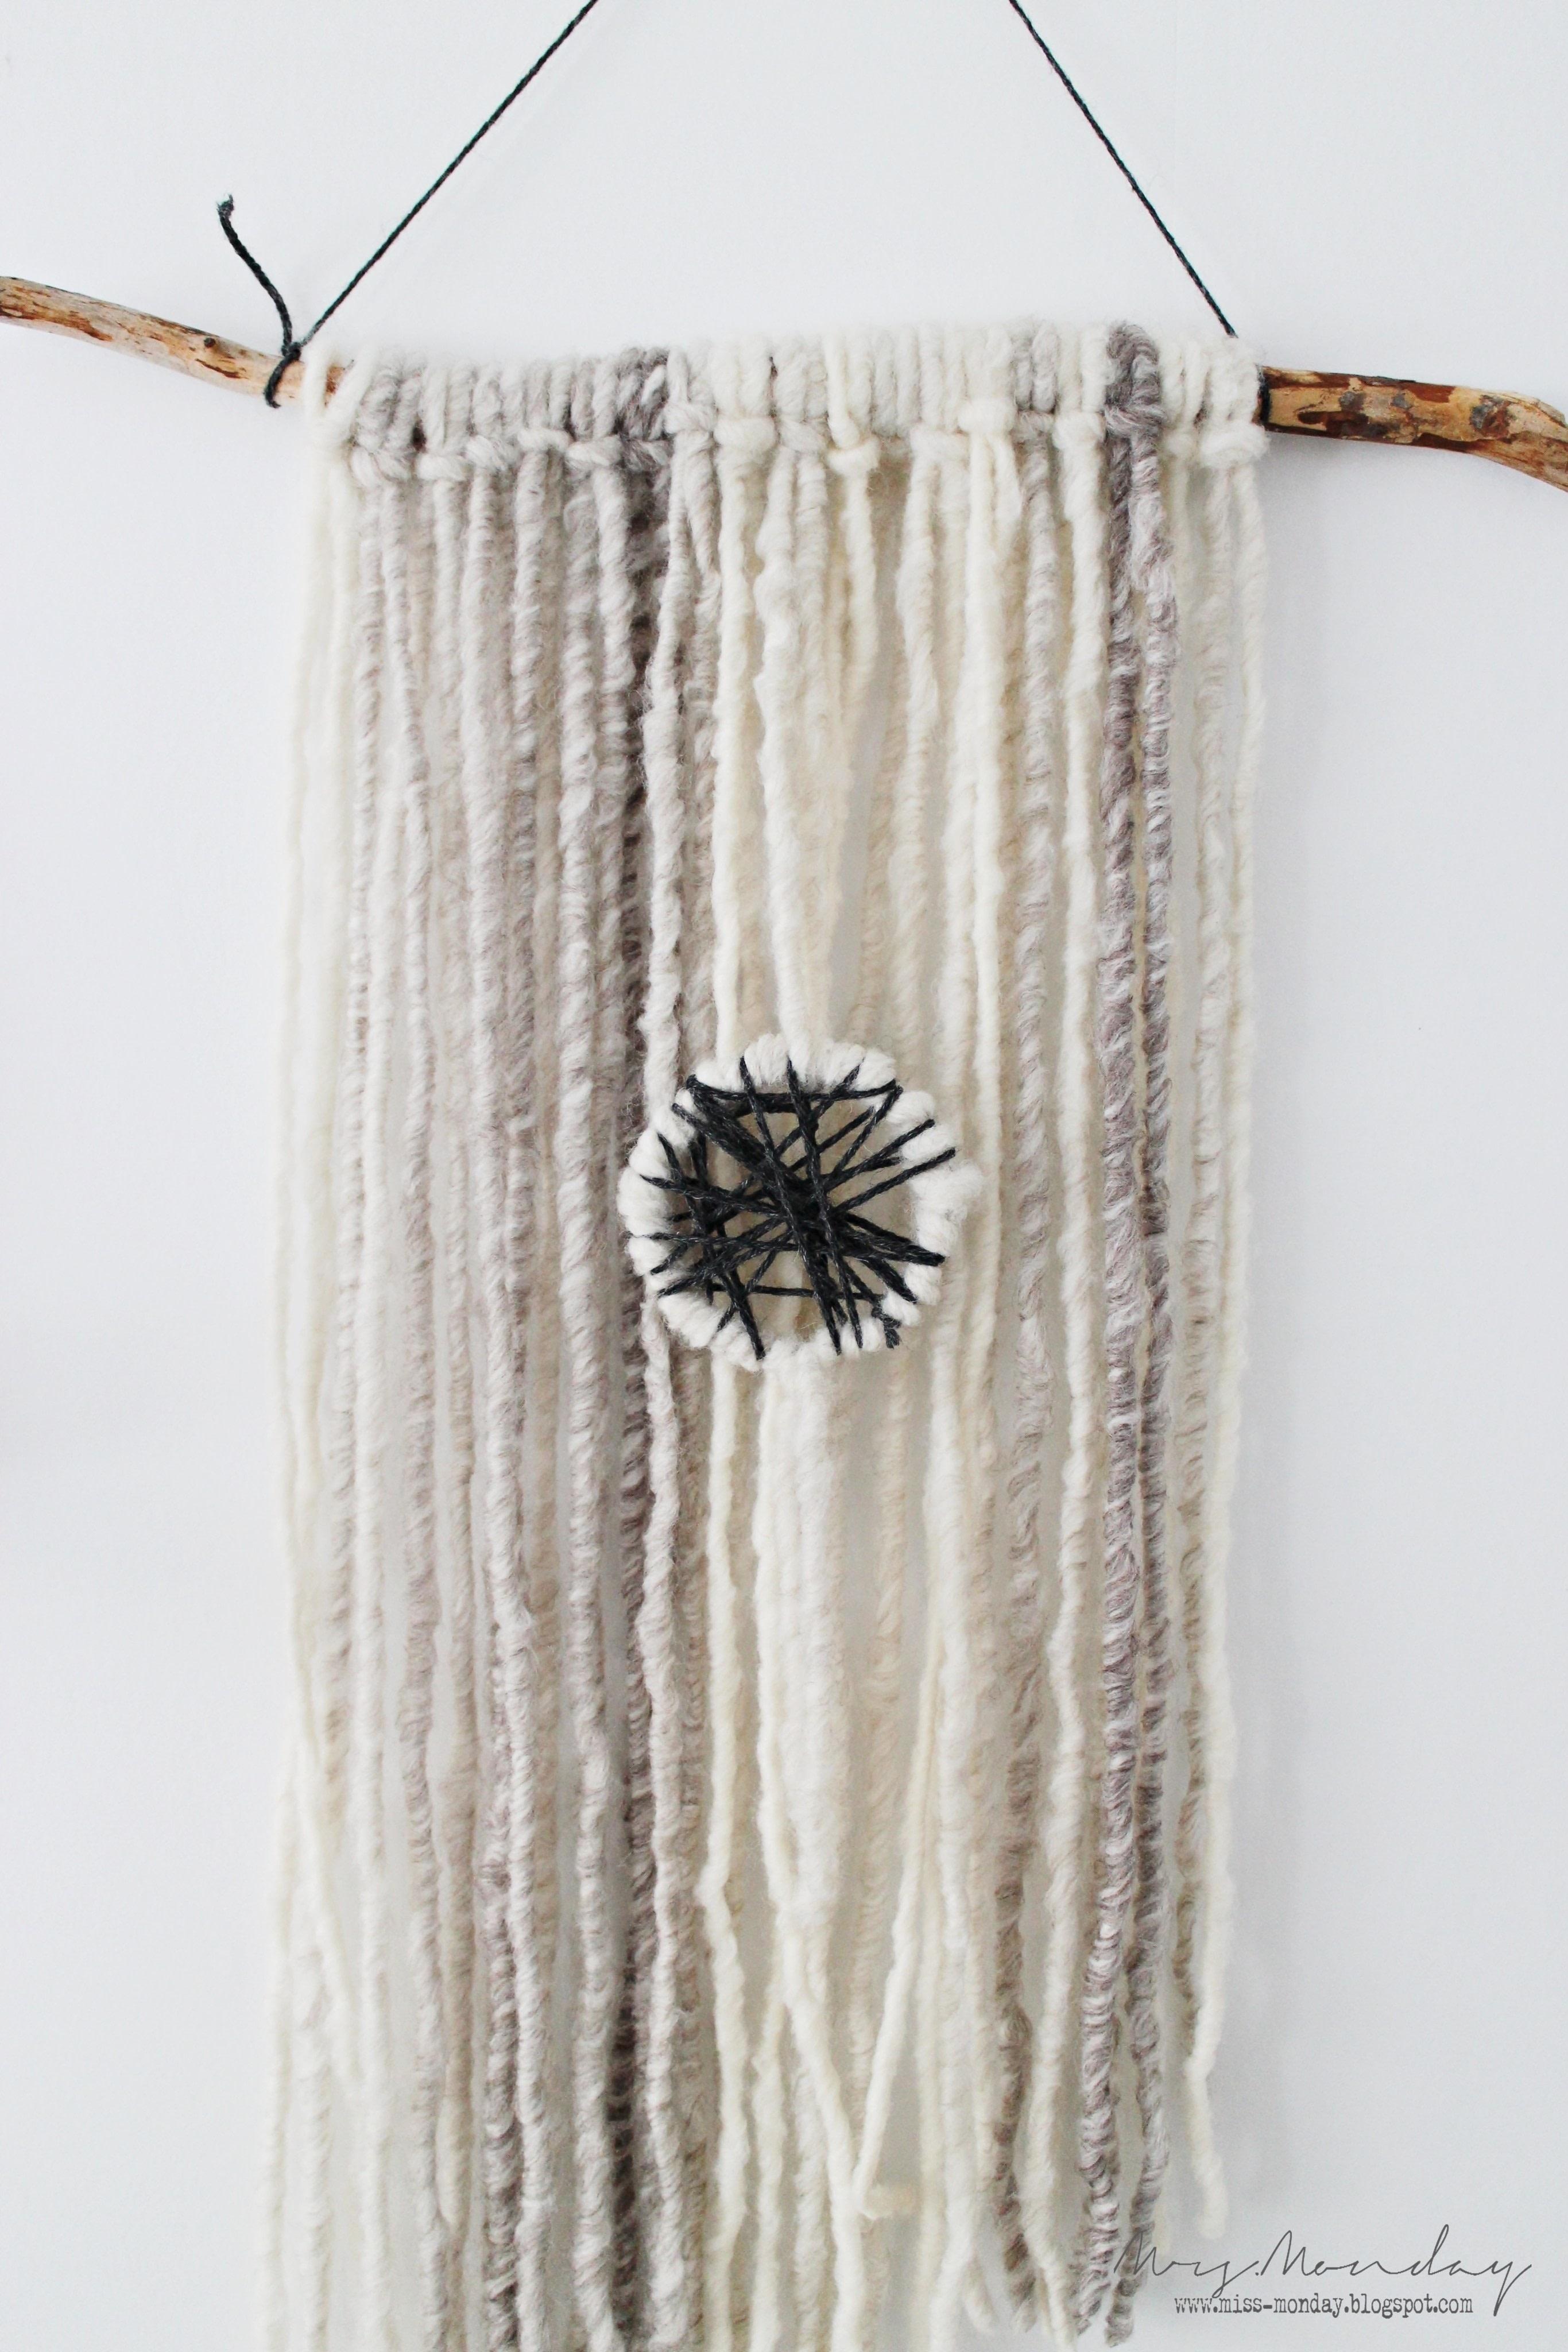 Diy Yarn Wallhanging ? How To Make A Yarn Wall Hanging ...